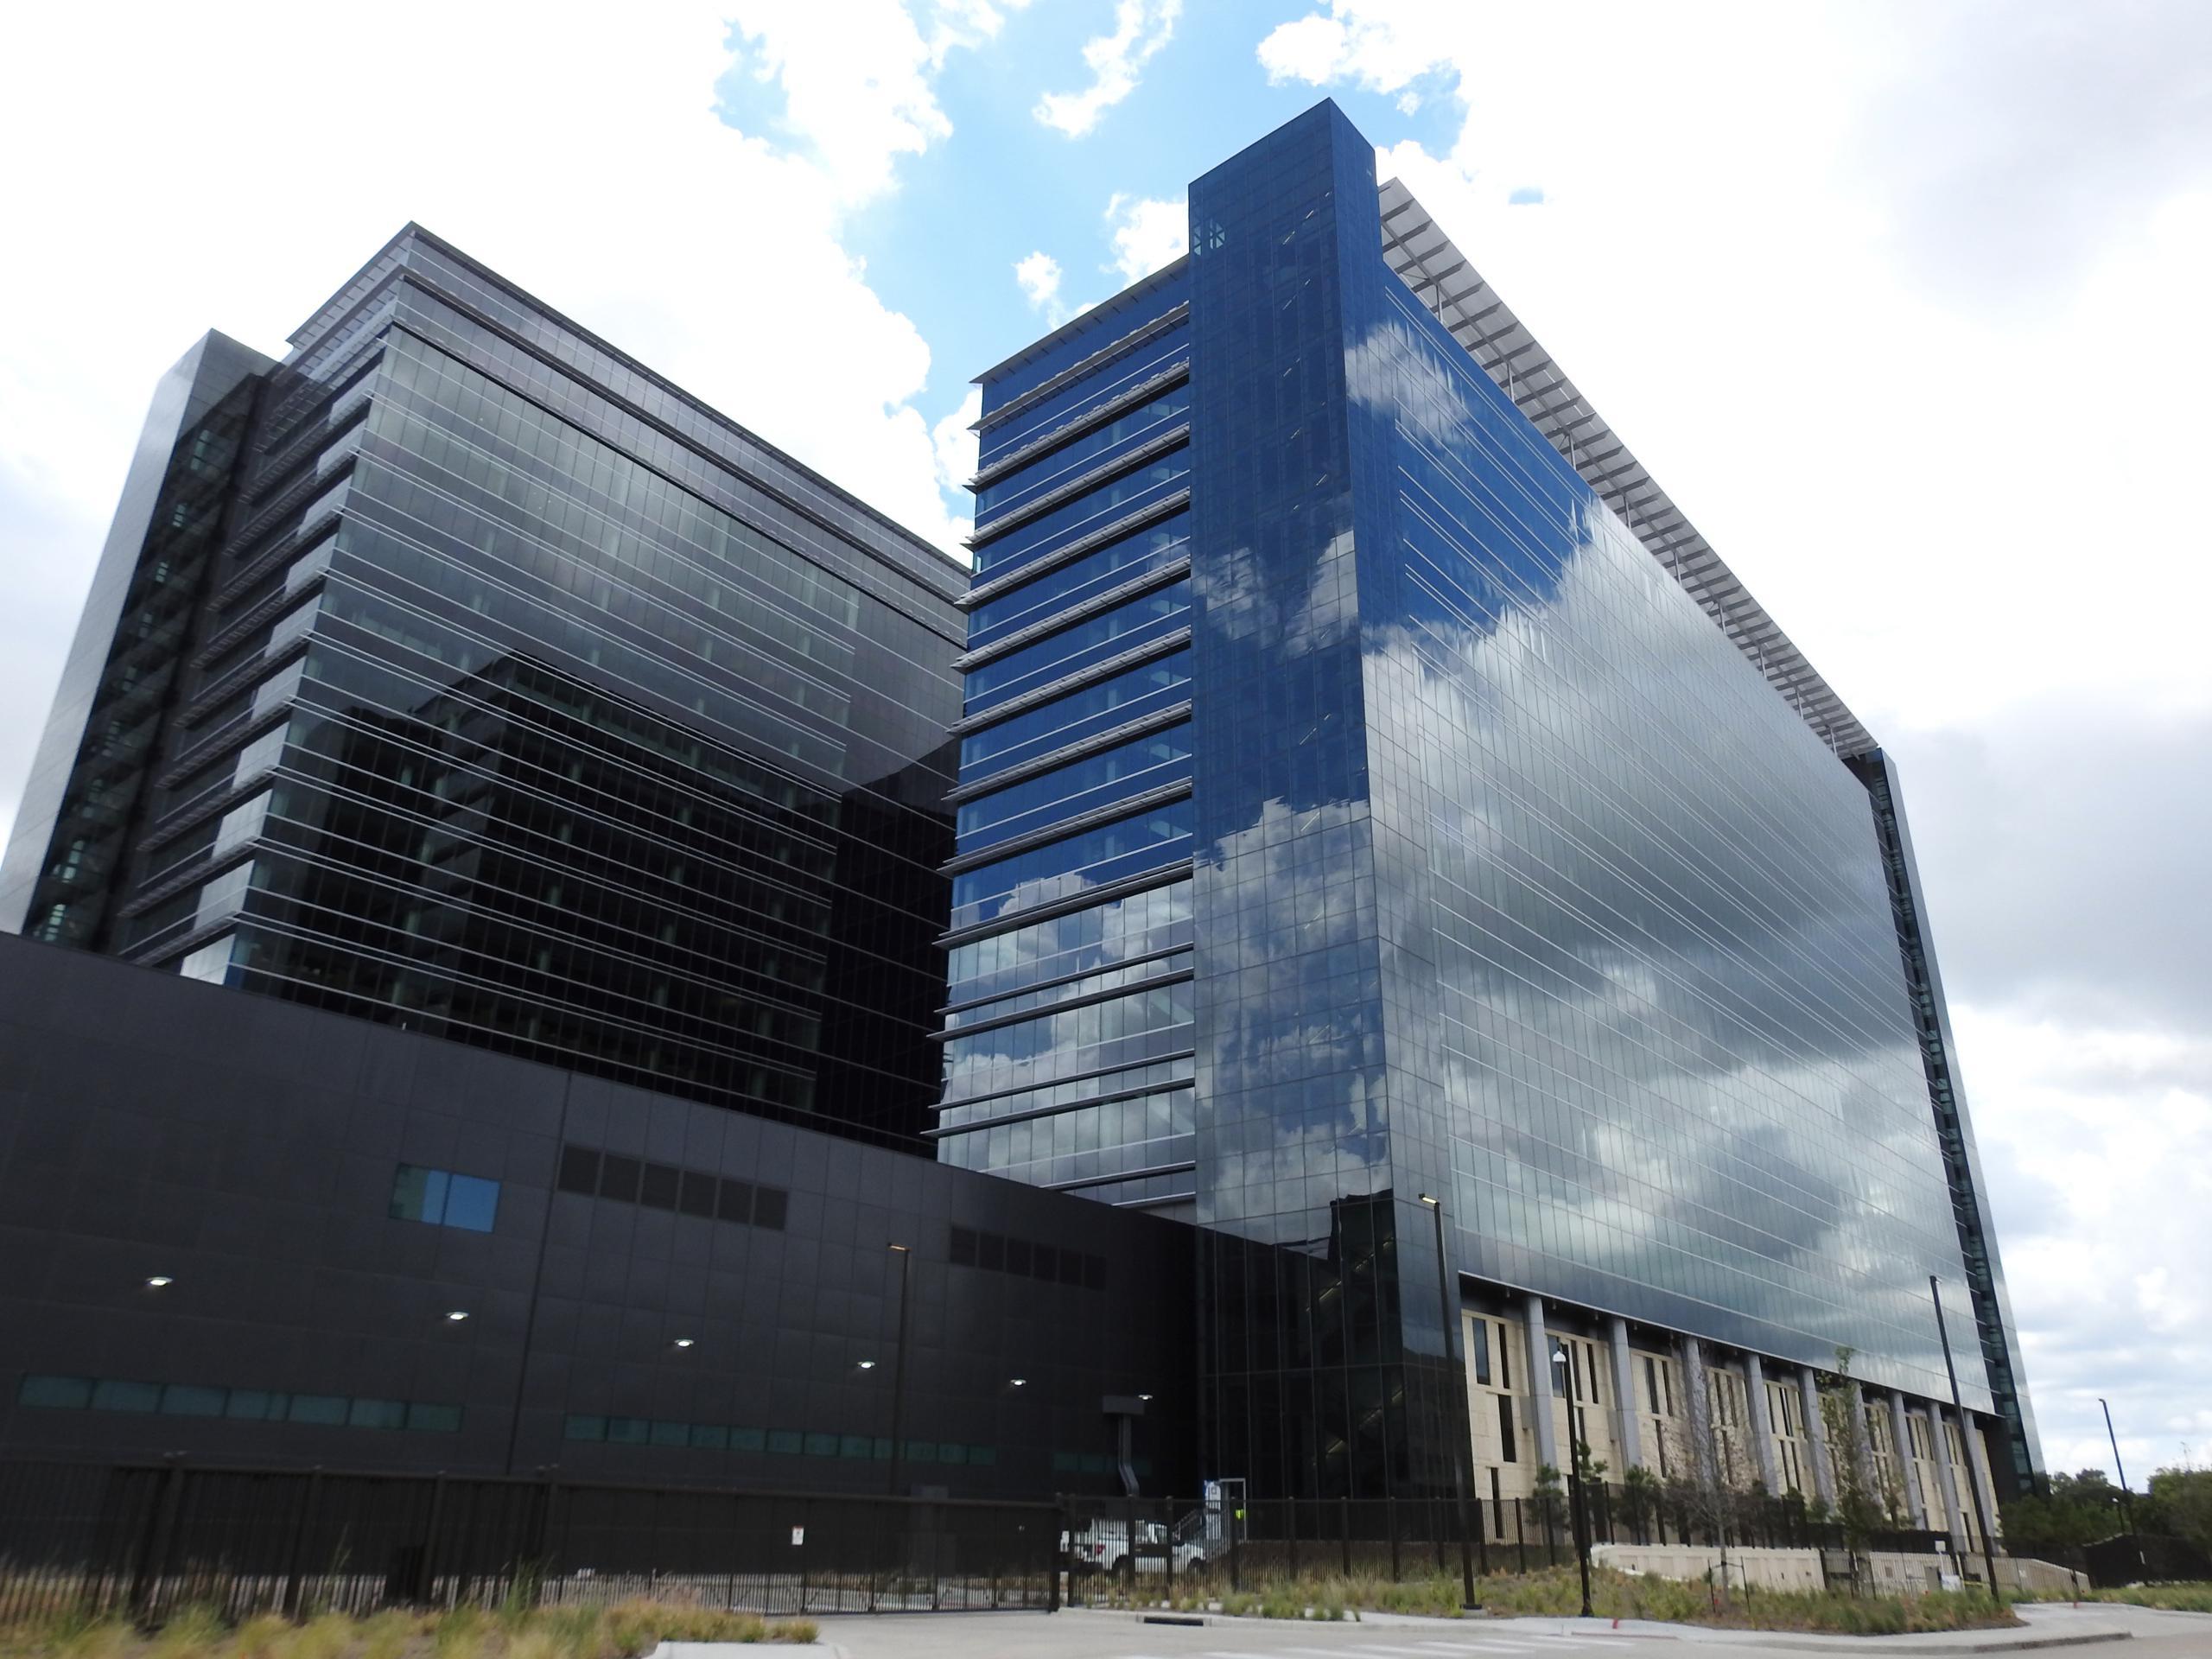 Phillips 66's corporate headquarters in Houston, Texas.